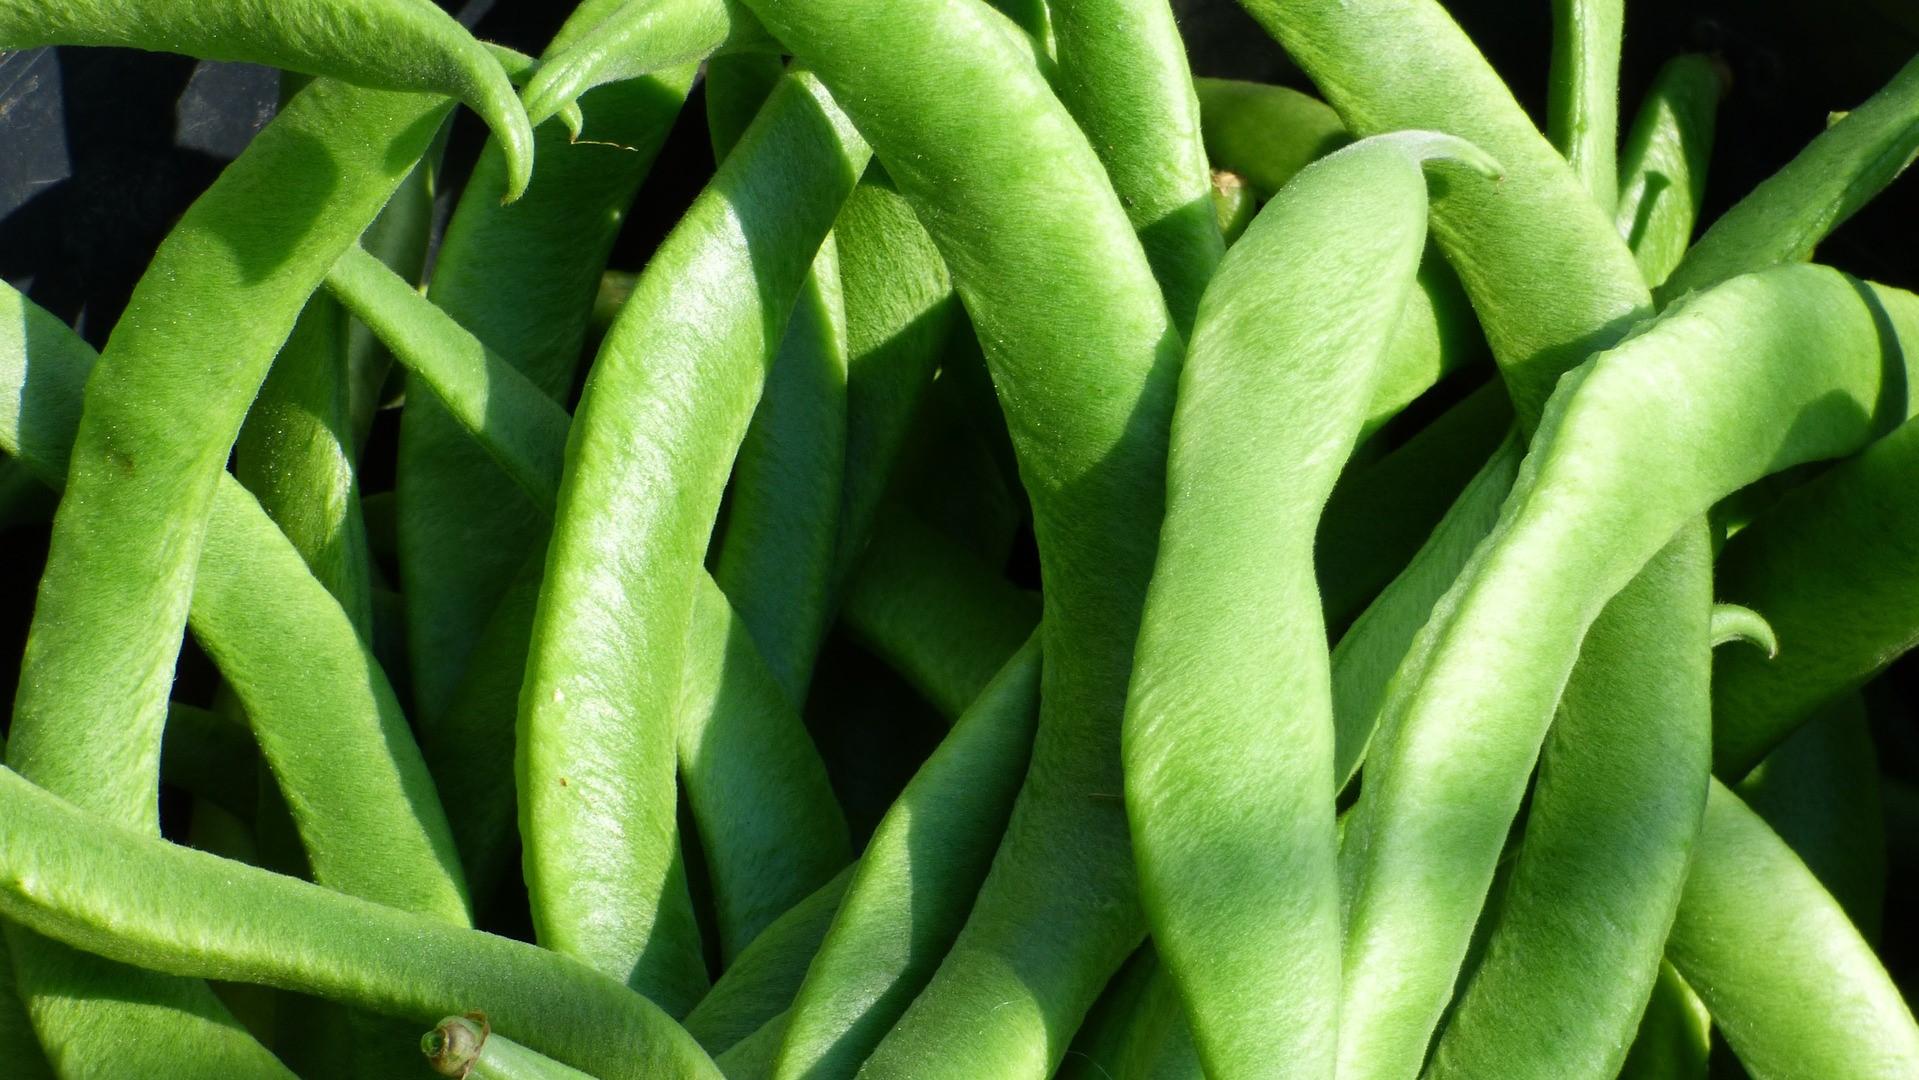 Attract Bees - flower - runner-beans - broad beans